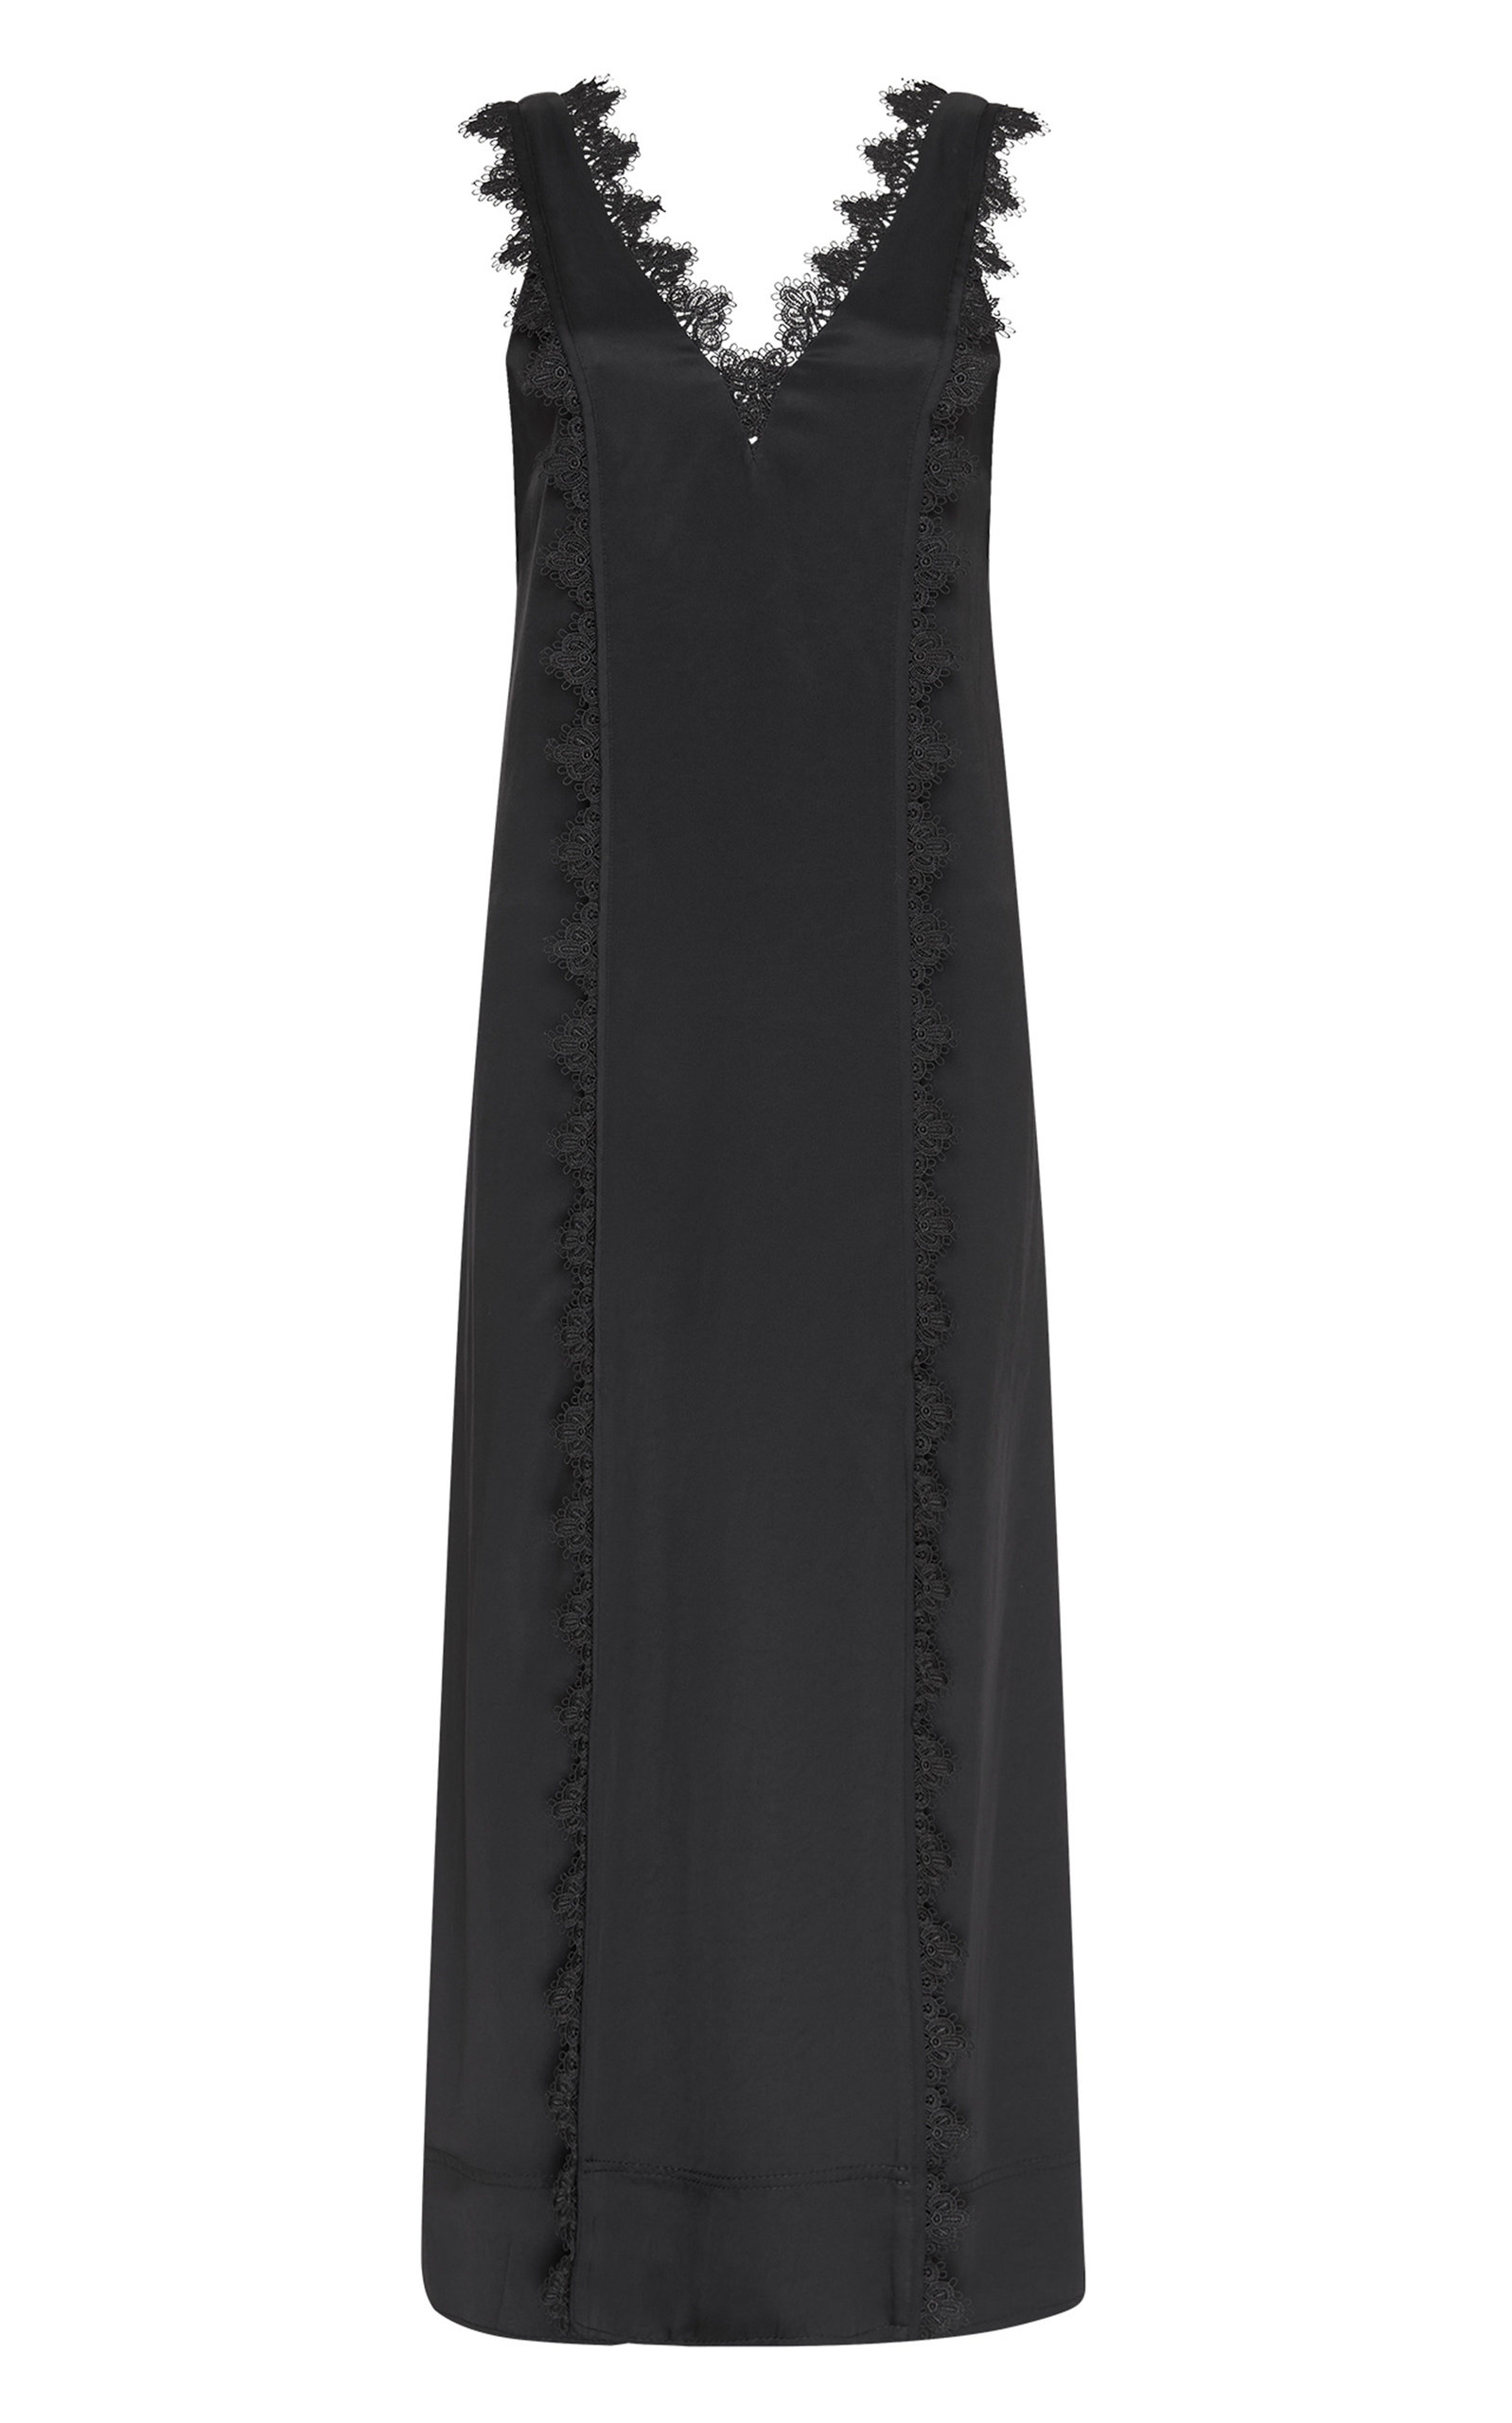 - Women's Veil Lace-Trimmed Satin Dress